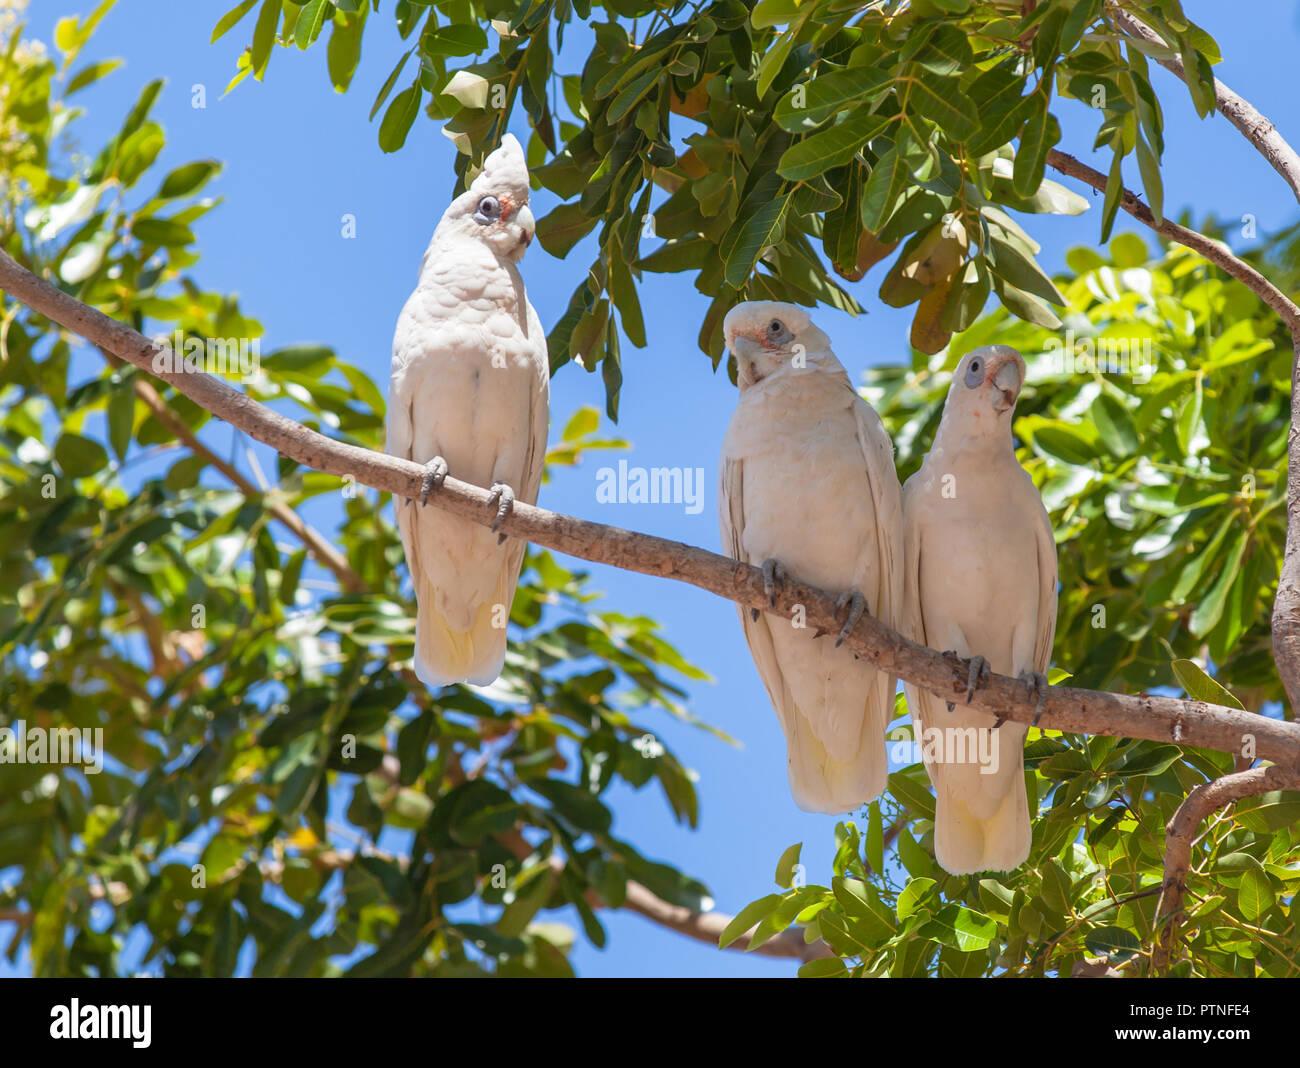 White Cockatoos sitting in a tree at Karumba, Queensland, Australia - Stock Image